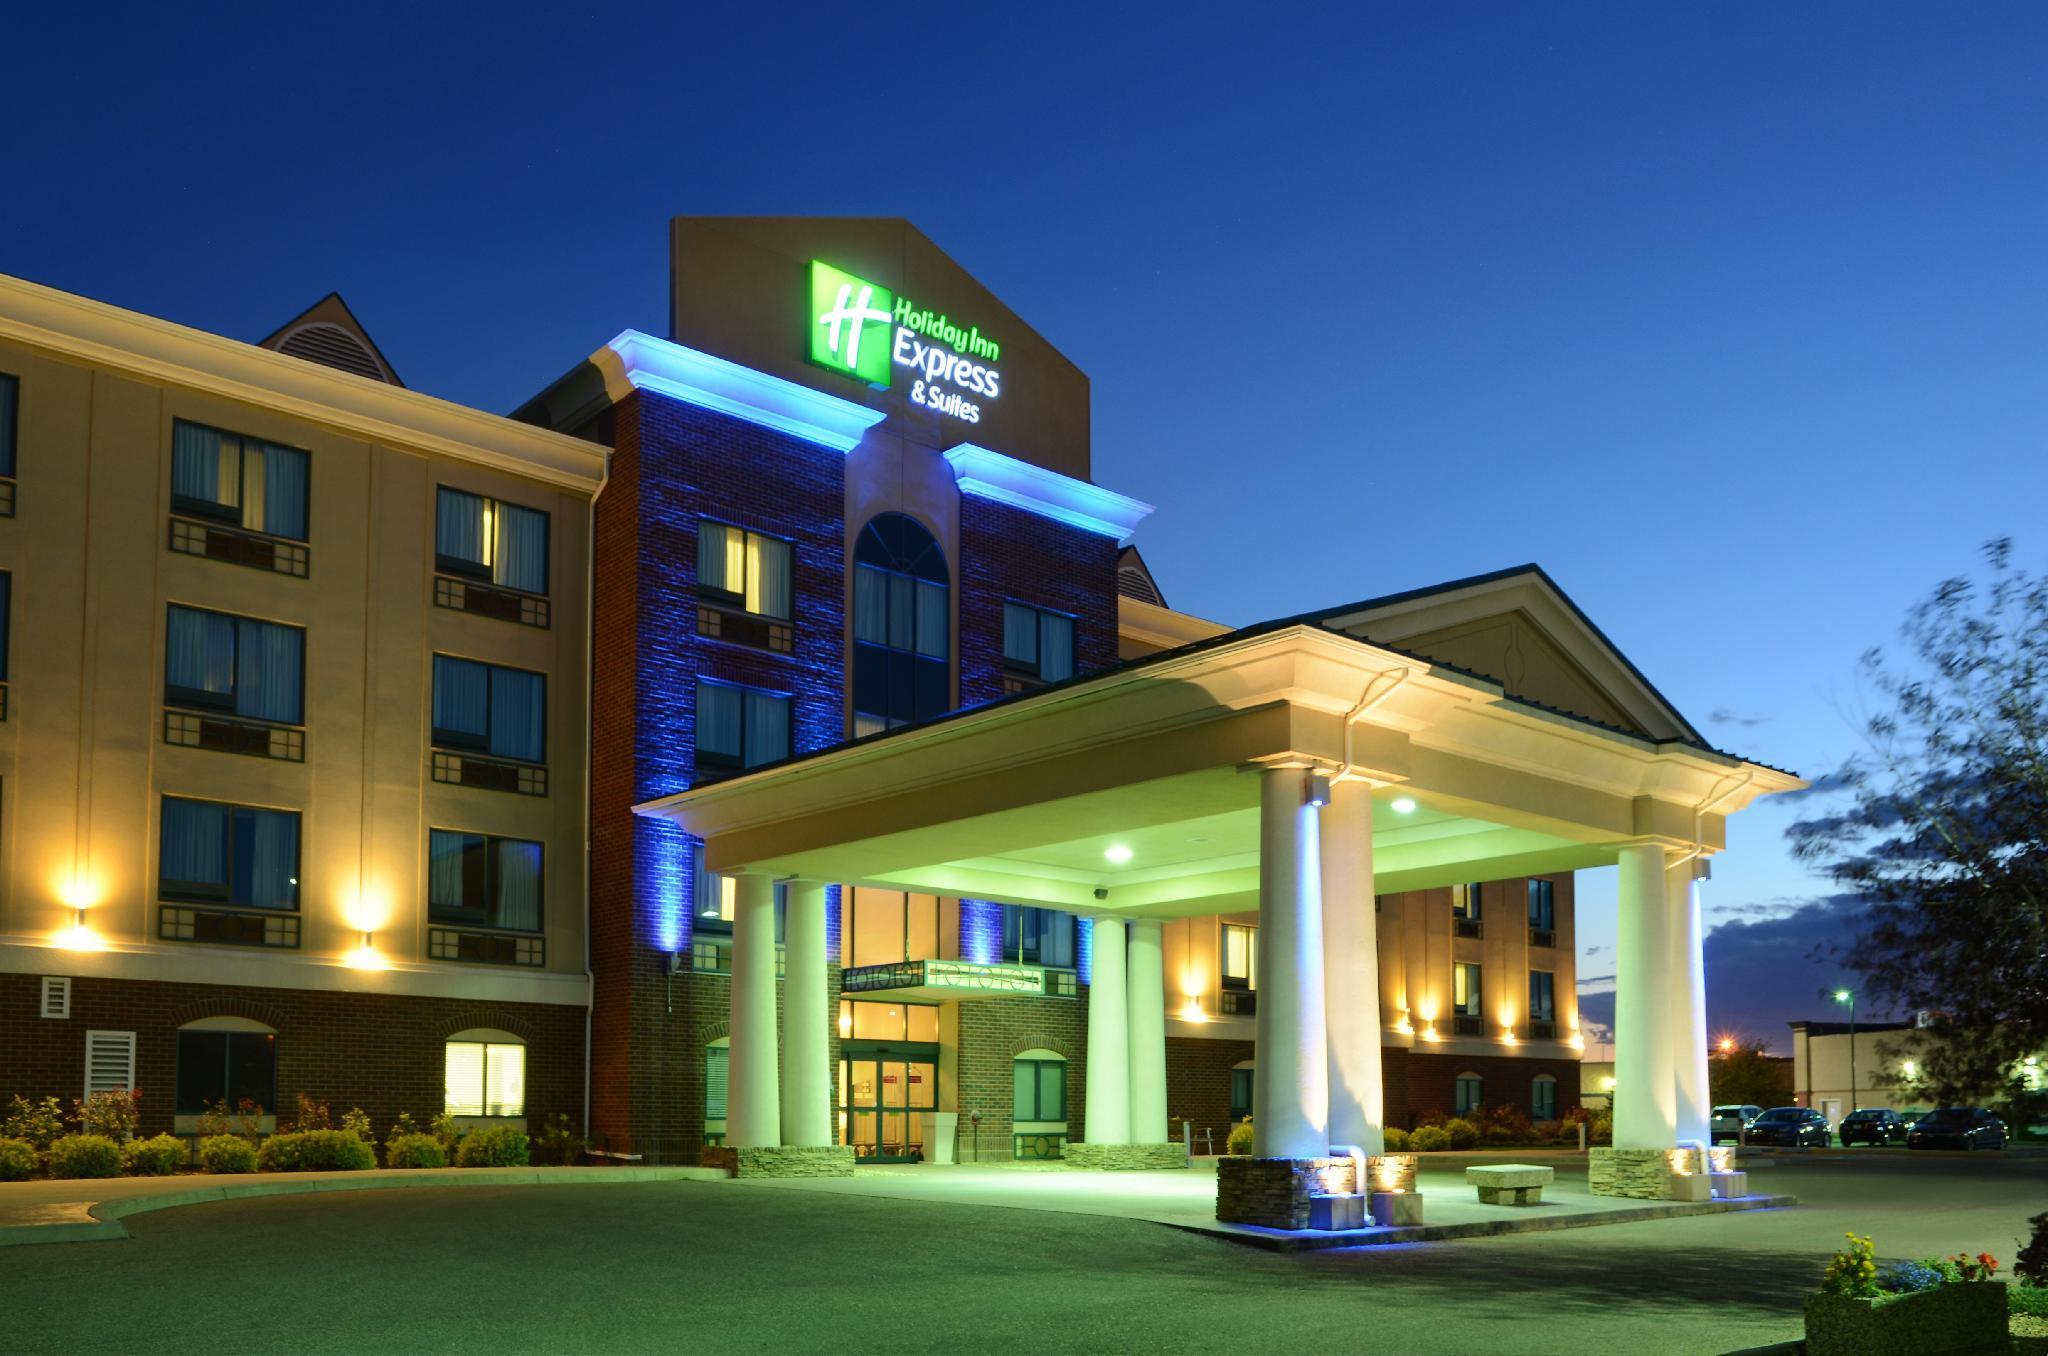 Holiday Inn Express Hotel & Suites Medicine Hat Transcanada Hwy 1